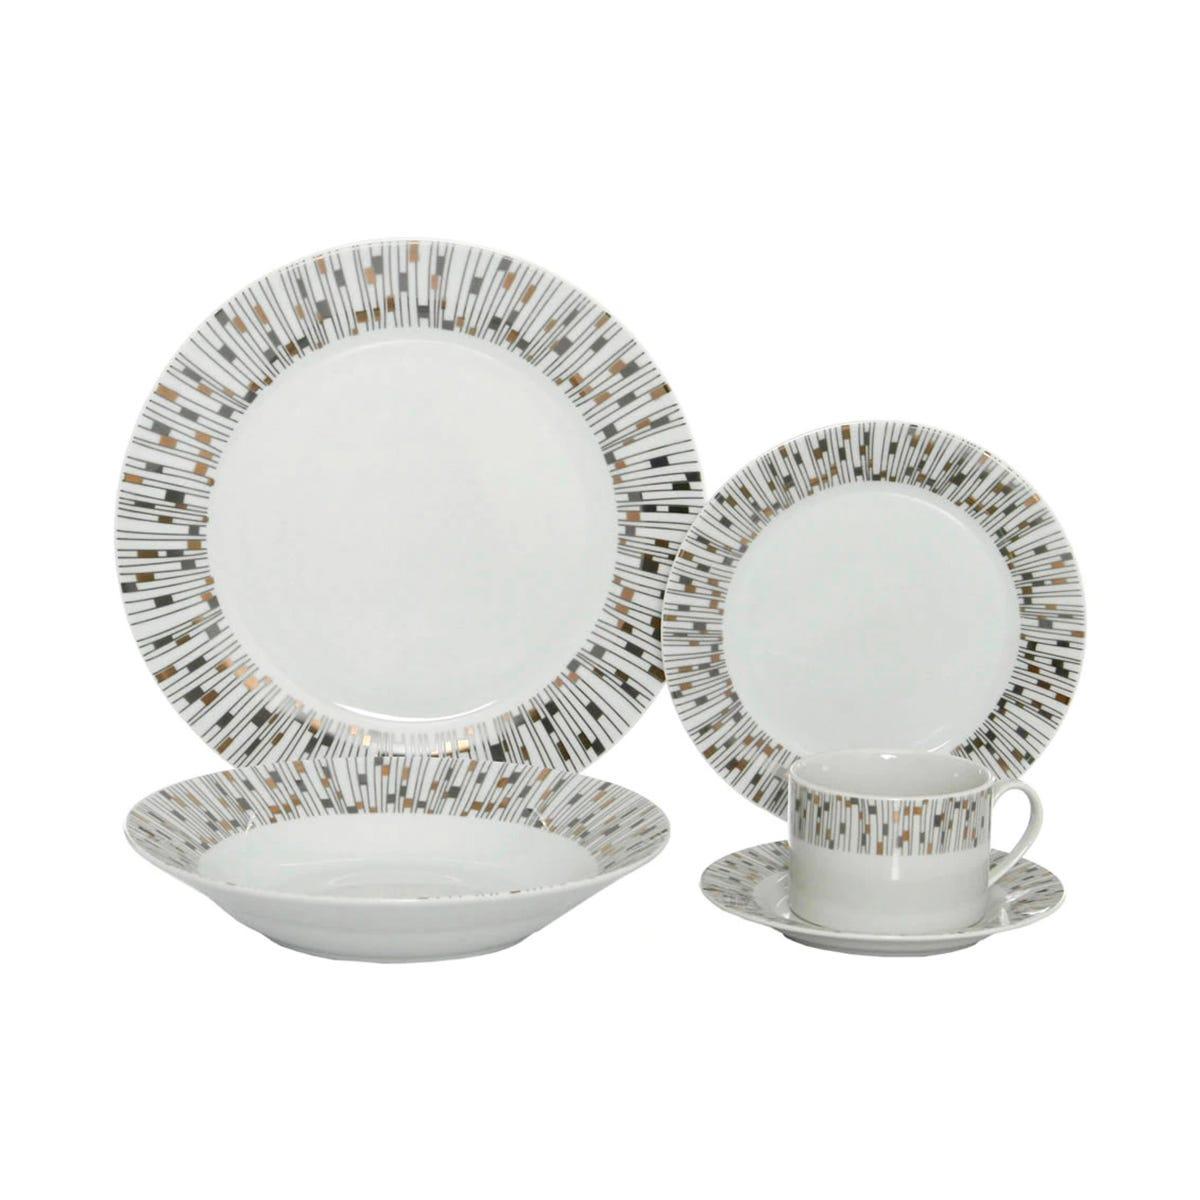 Vajilla Top Choice® Spark Redonda de Porcelana 20 piezas